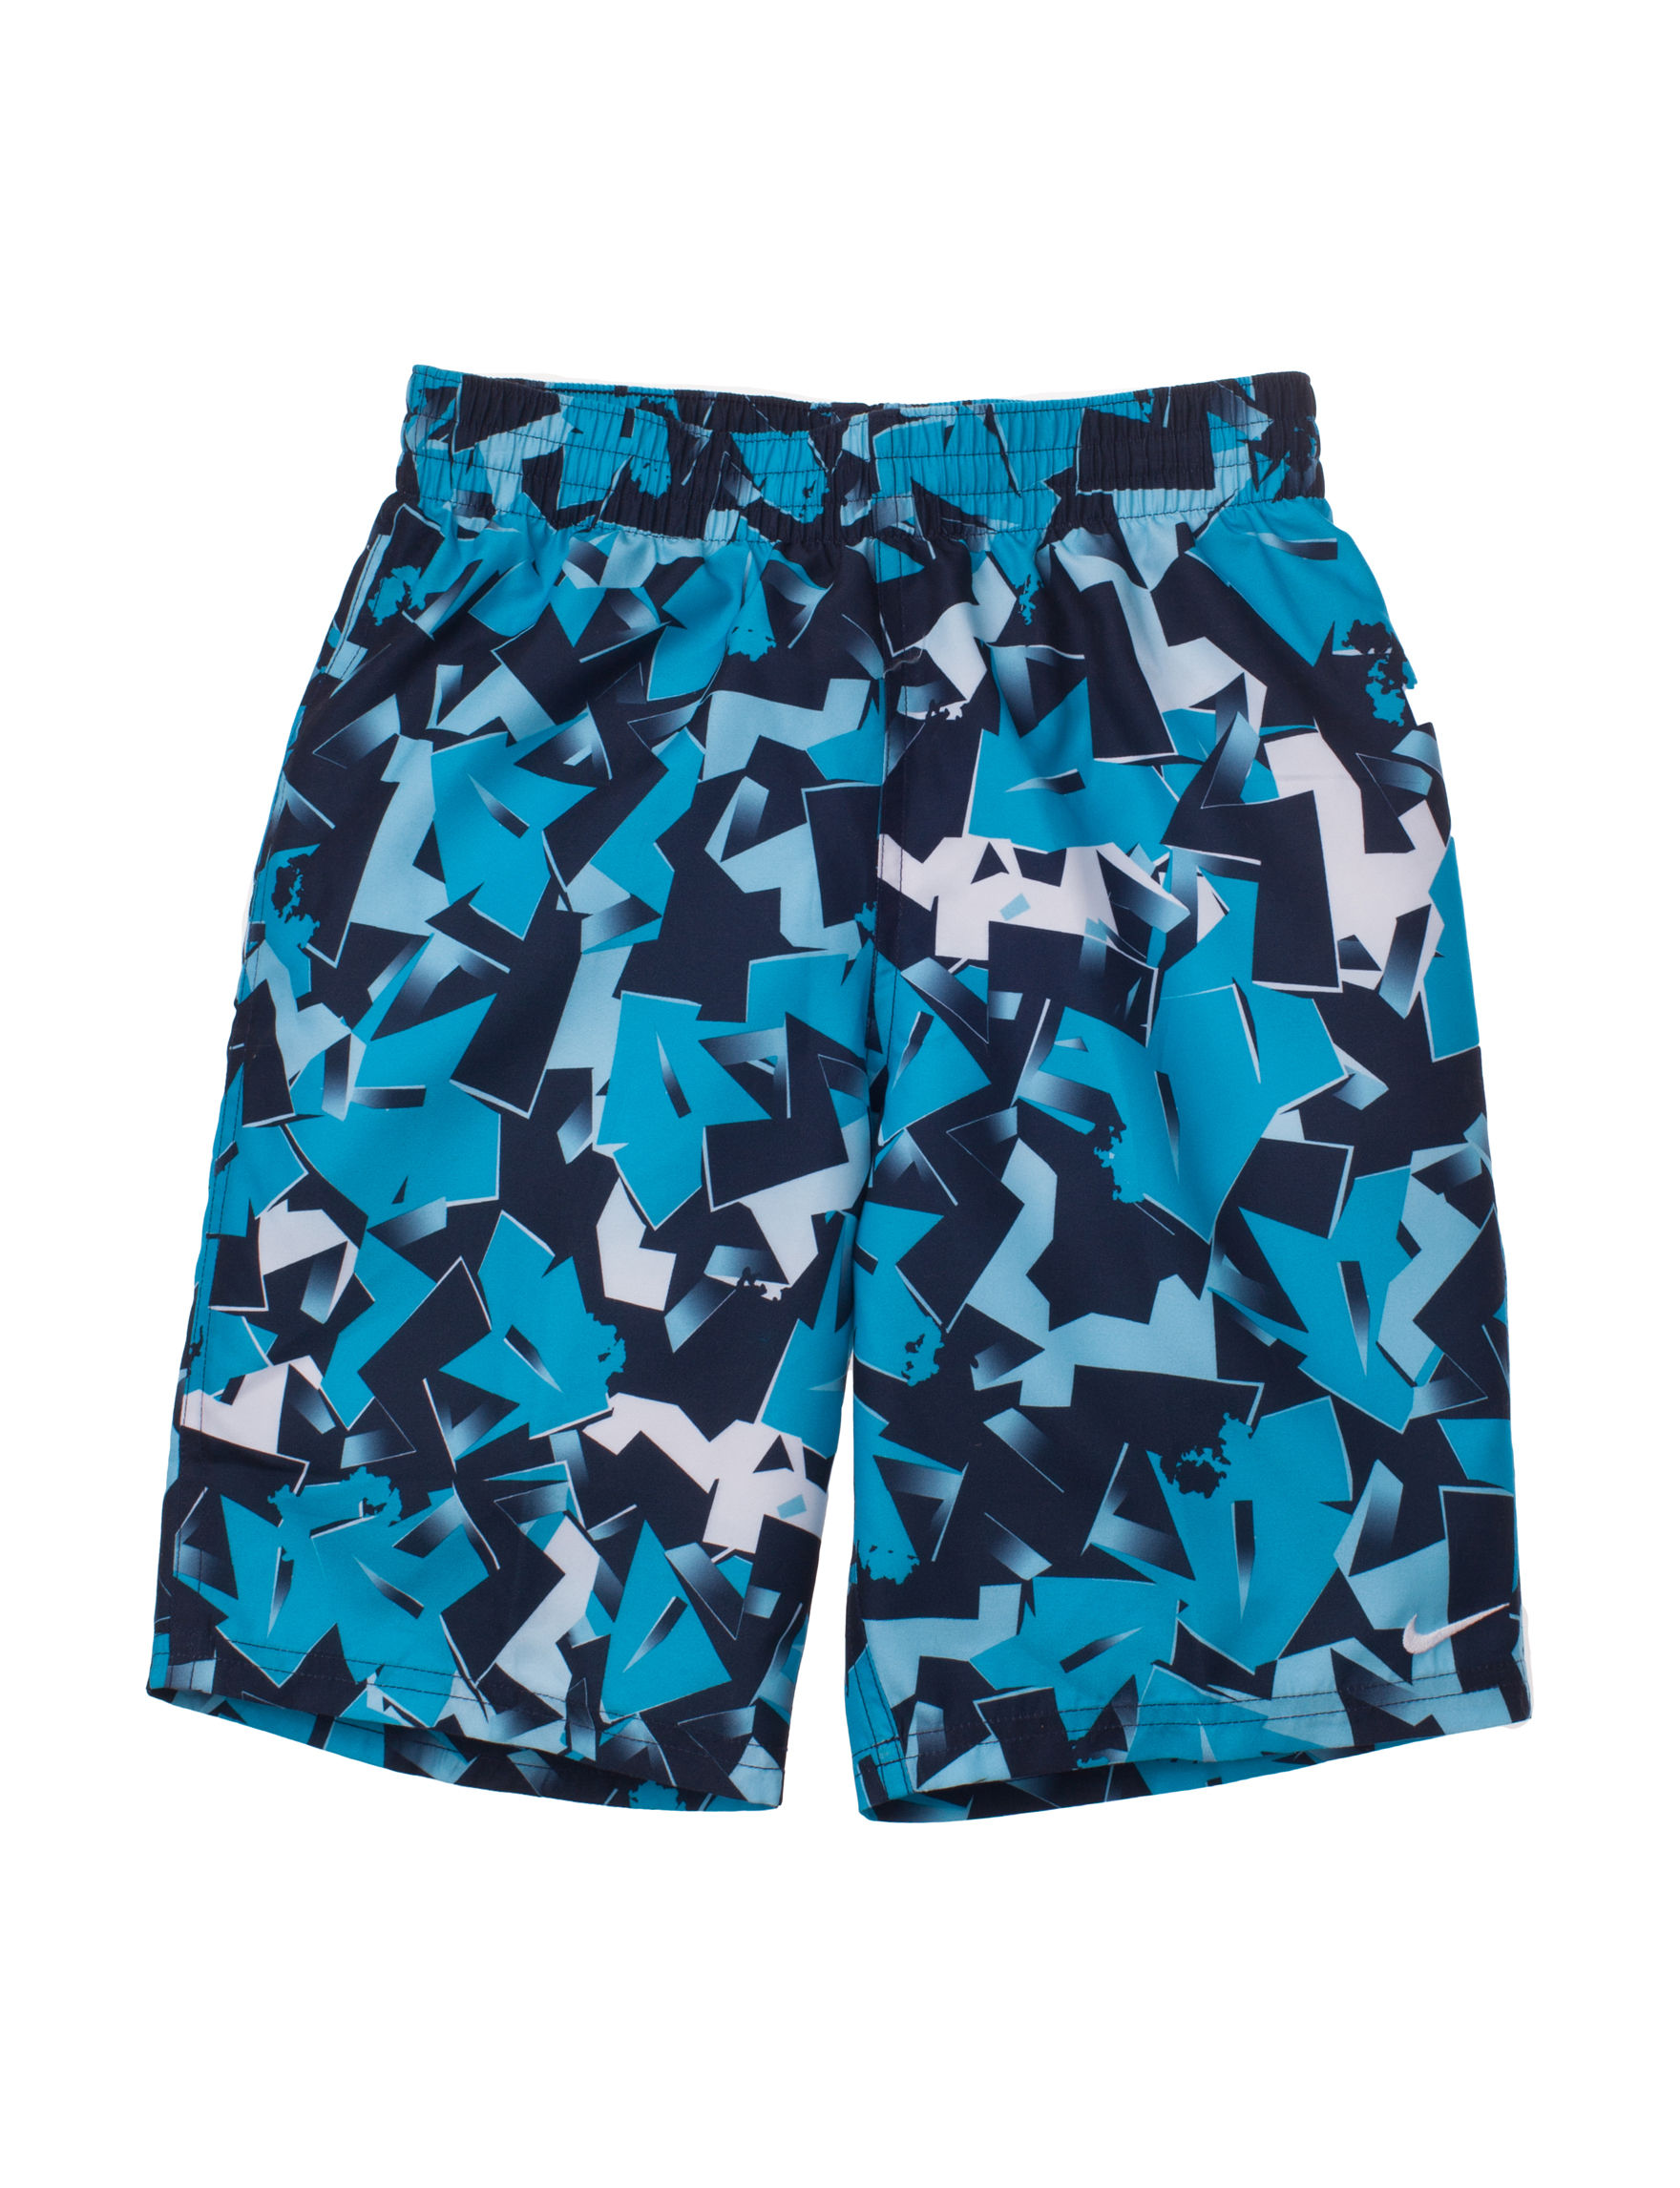 Nike Blue Swimsuit Bottoms